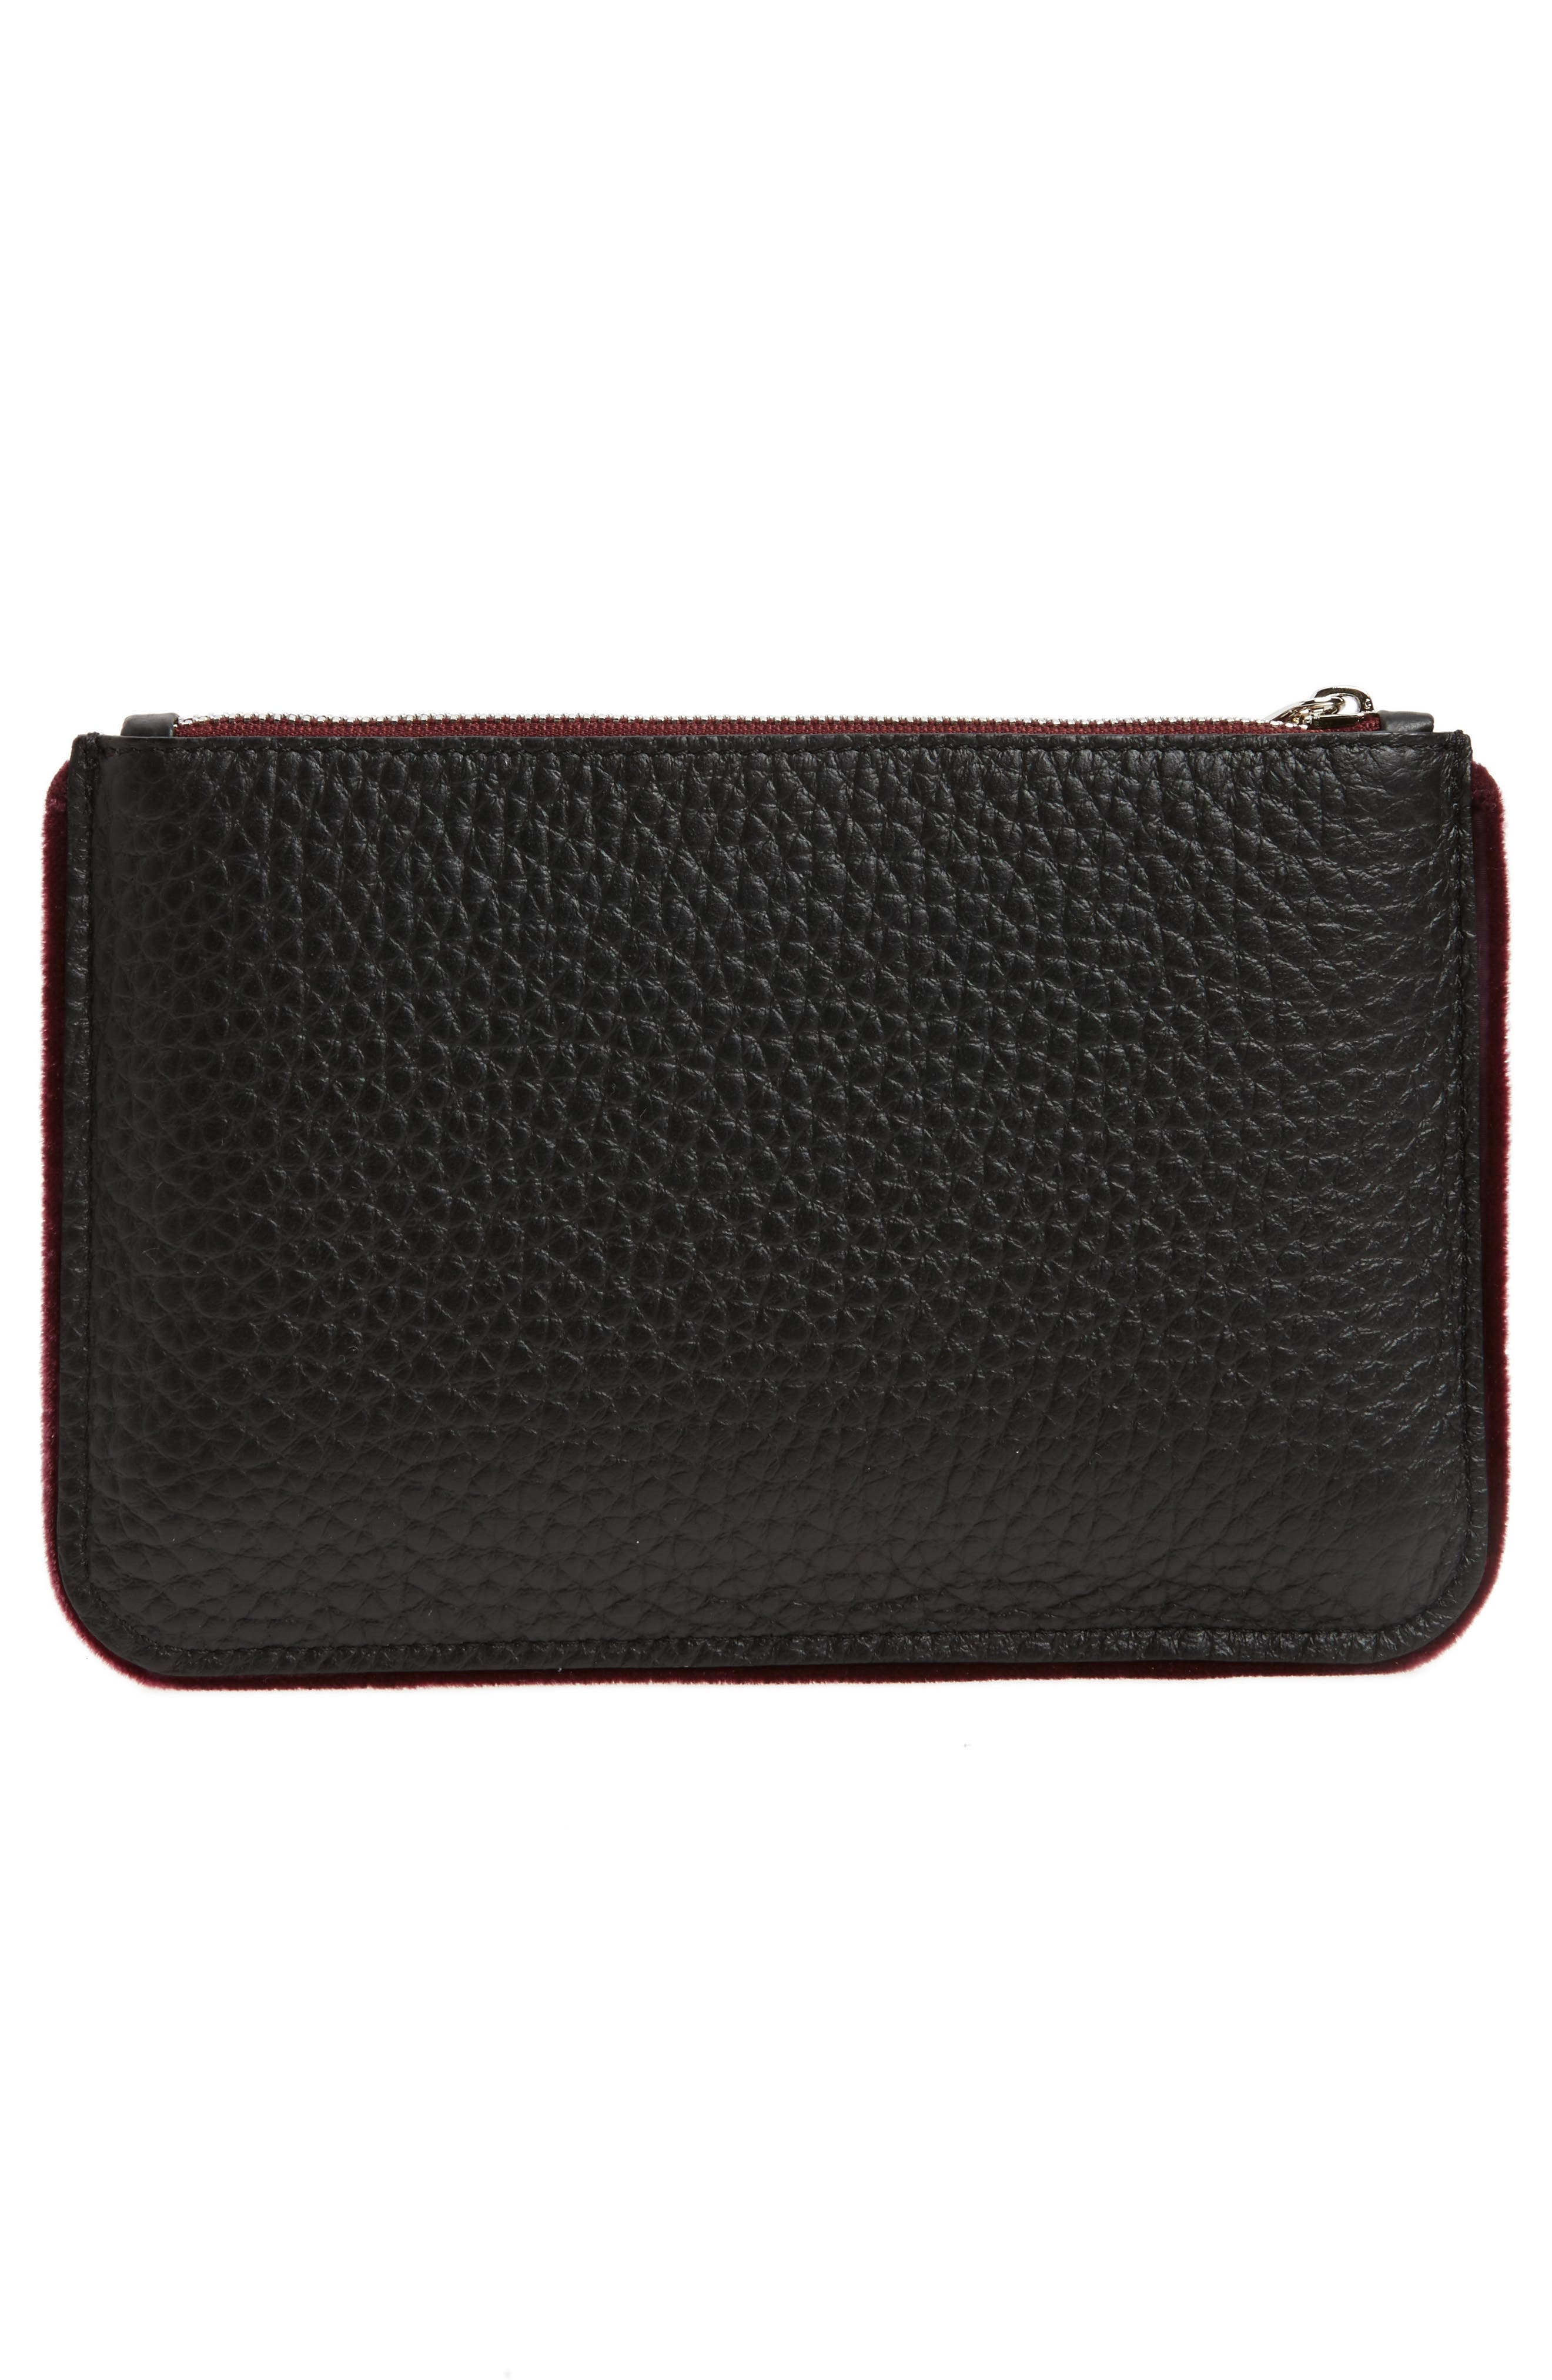 Large Soft Line Velvet Trim Calfskin Leather Pouch,                             Alternate thumbnail 6, color,